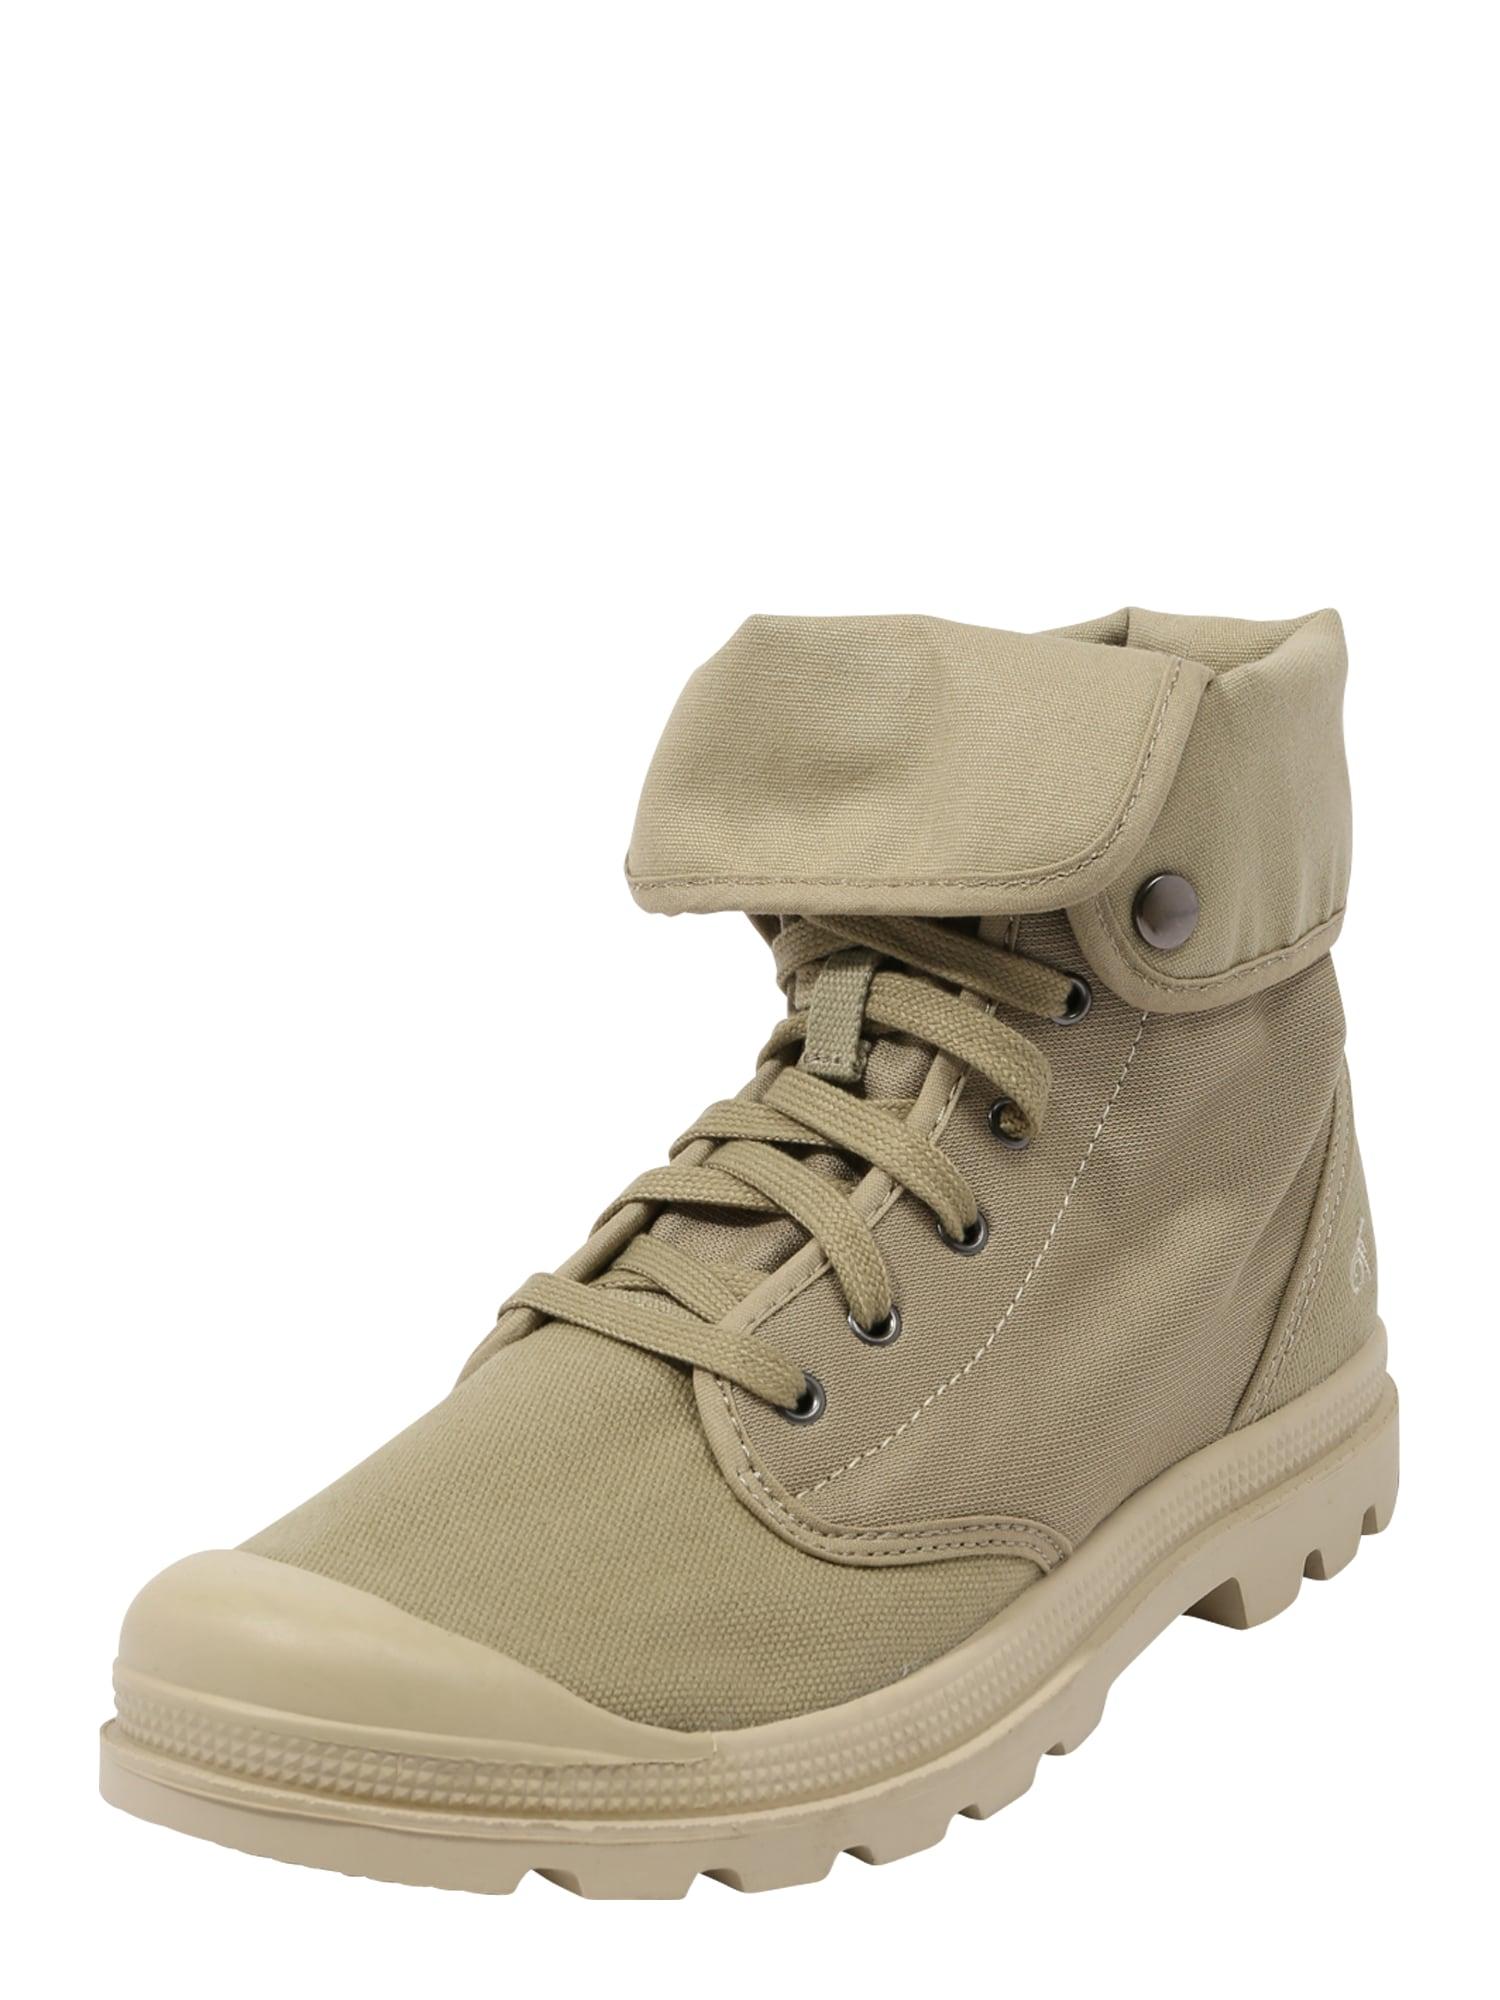 CRAGHOPPERS Auliniai batai smėlio